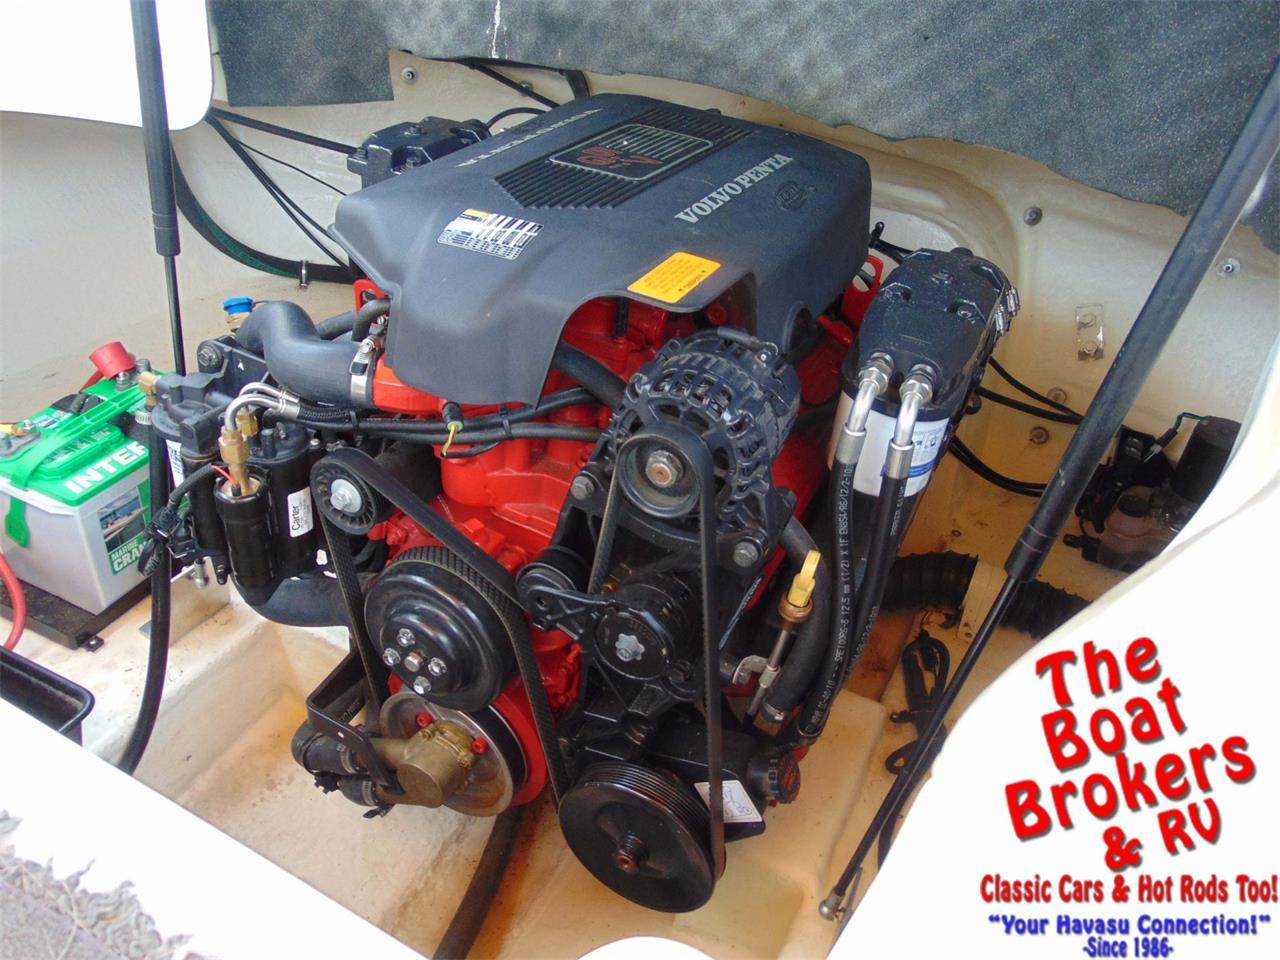 2004 Miscellaneous Boat (CC-1306656) for sale in Lake Havasu, Arizona